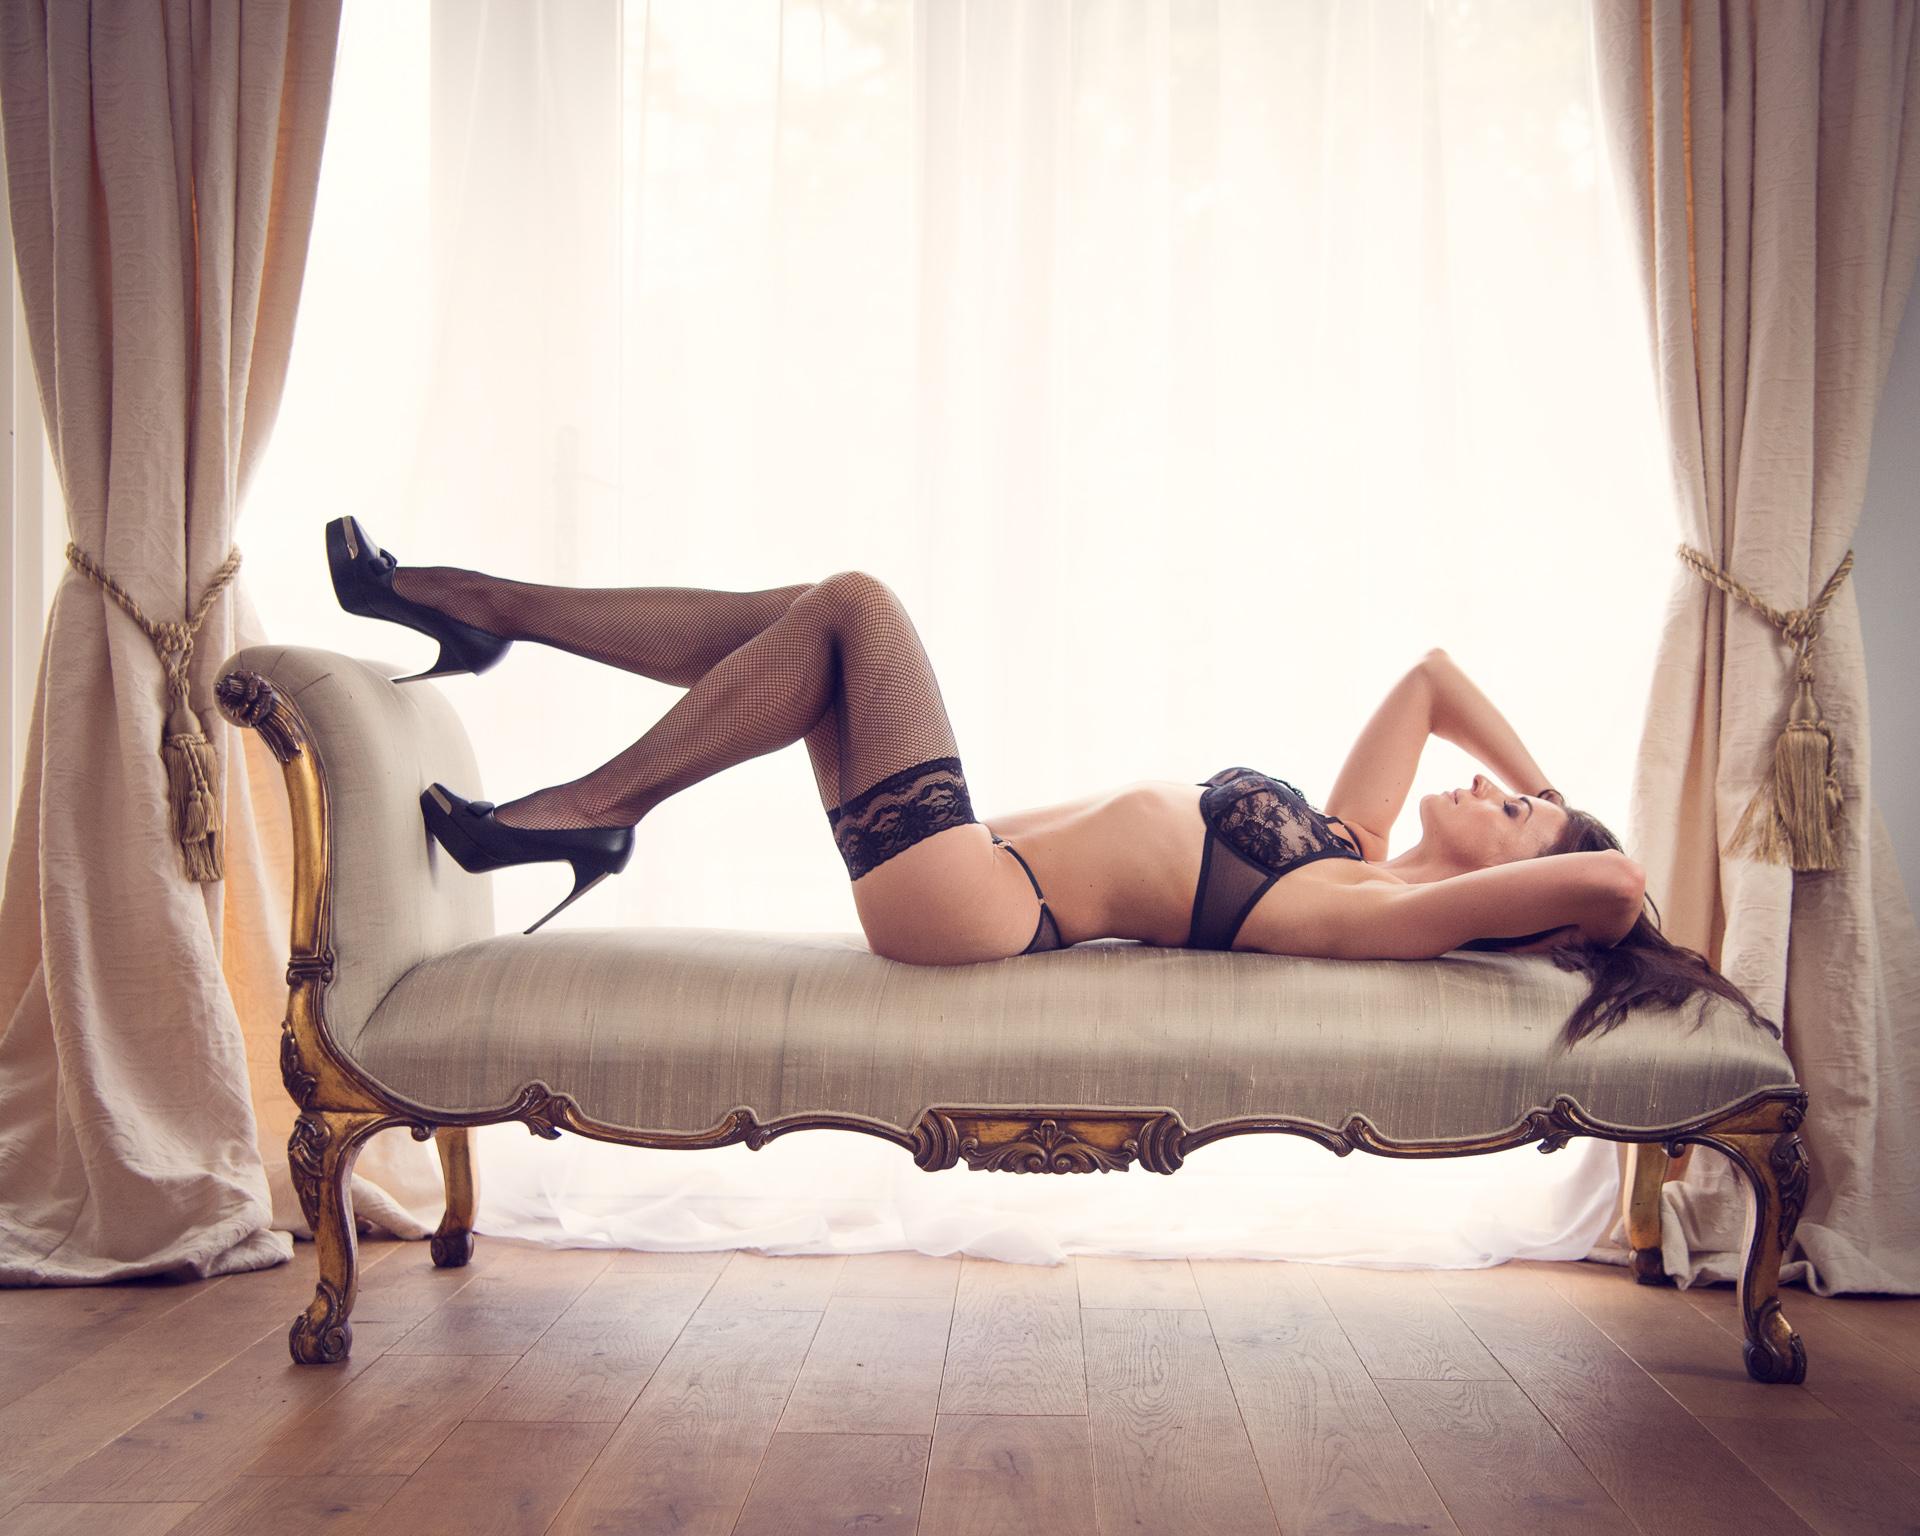 https://katehopewellsmith.com/wp-content/uploads/boudoir-photography-inspiration-kate-hopewell-smith-3.jpg